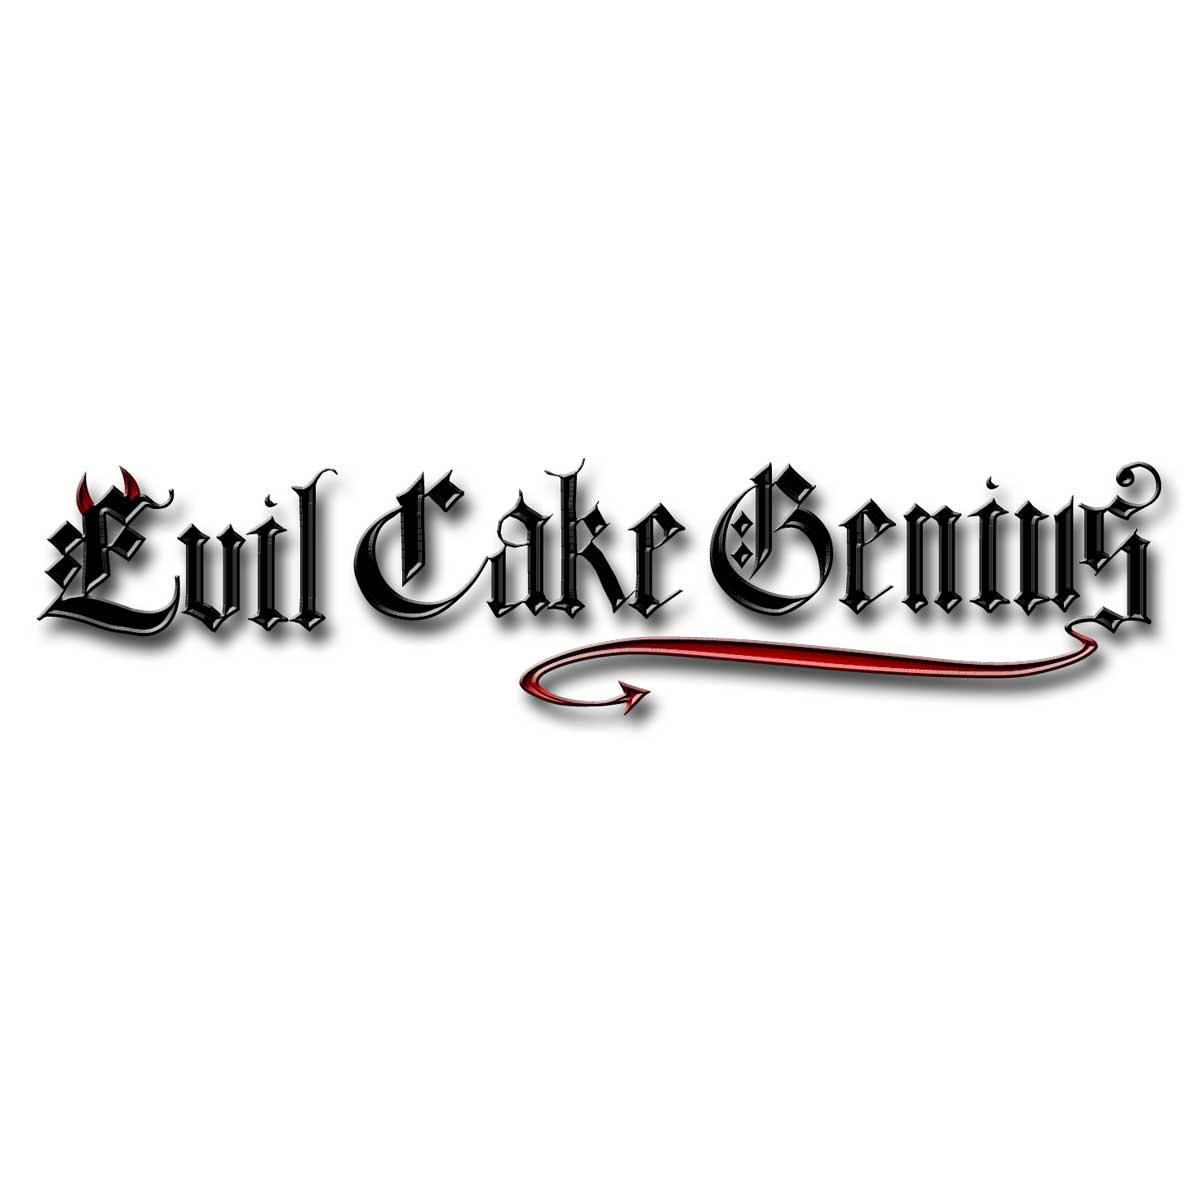 Superbirthday Cake Complete Stencil Set Evil Cake Genius